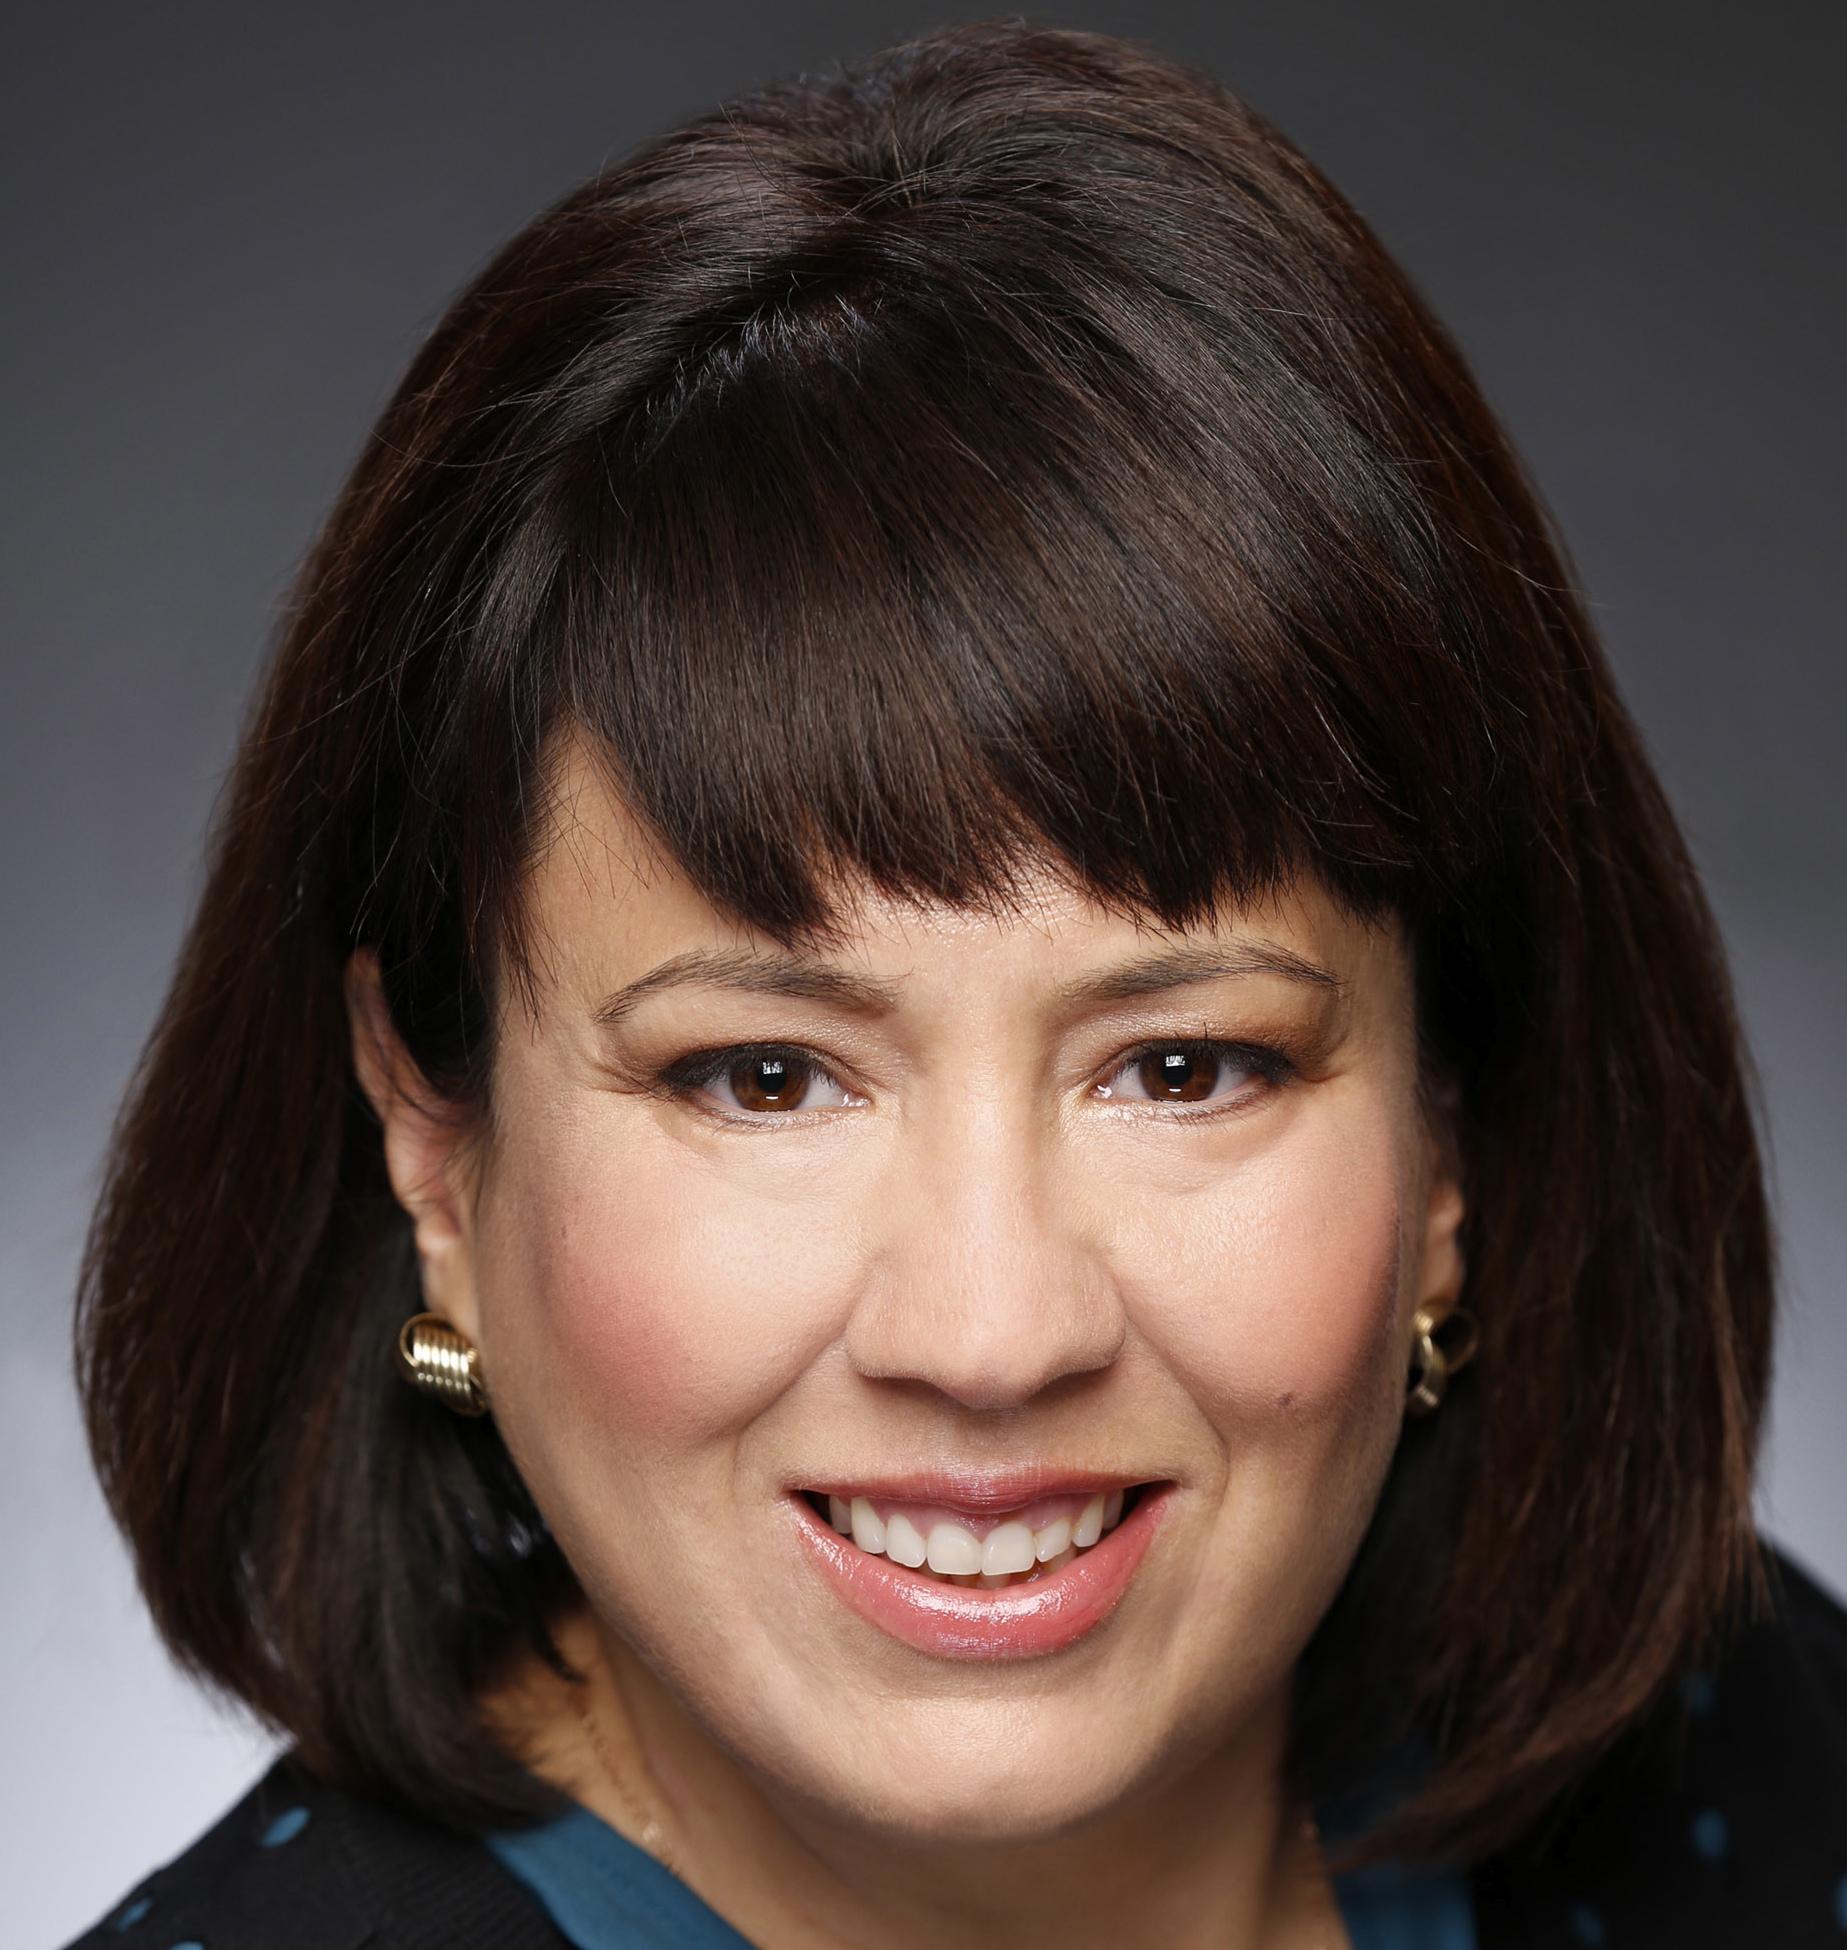 VP Equity & Inclusion, WarnerMedia